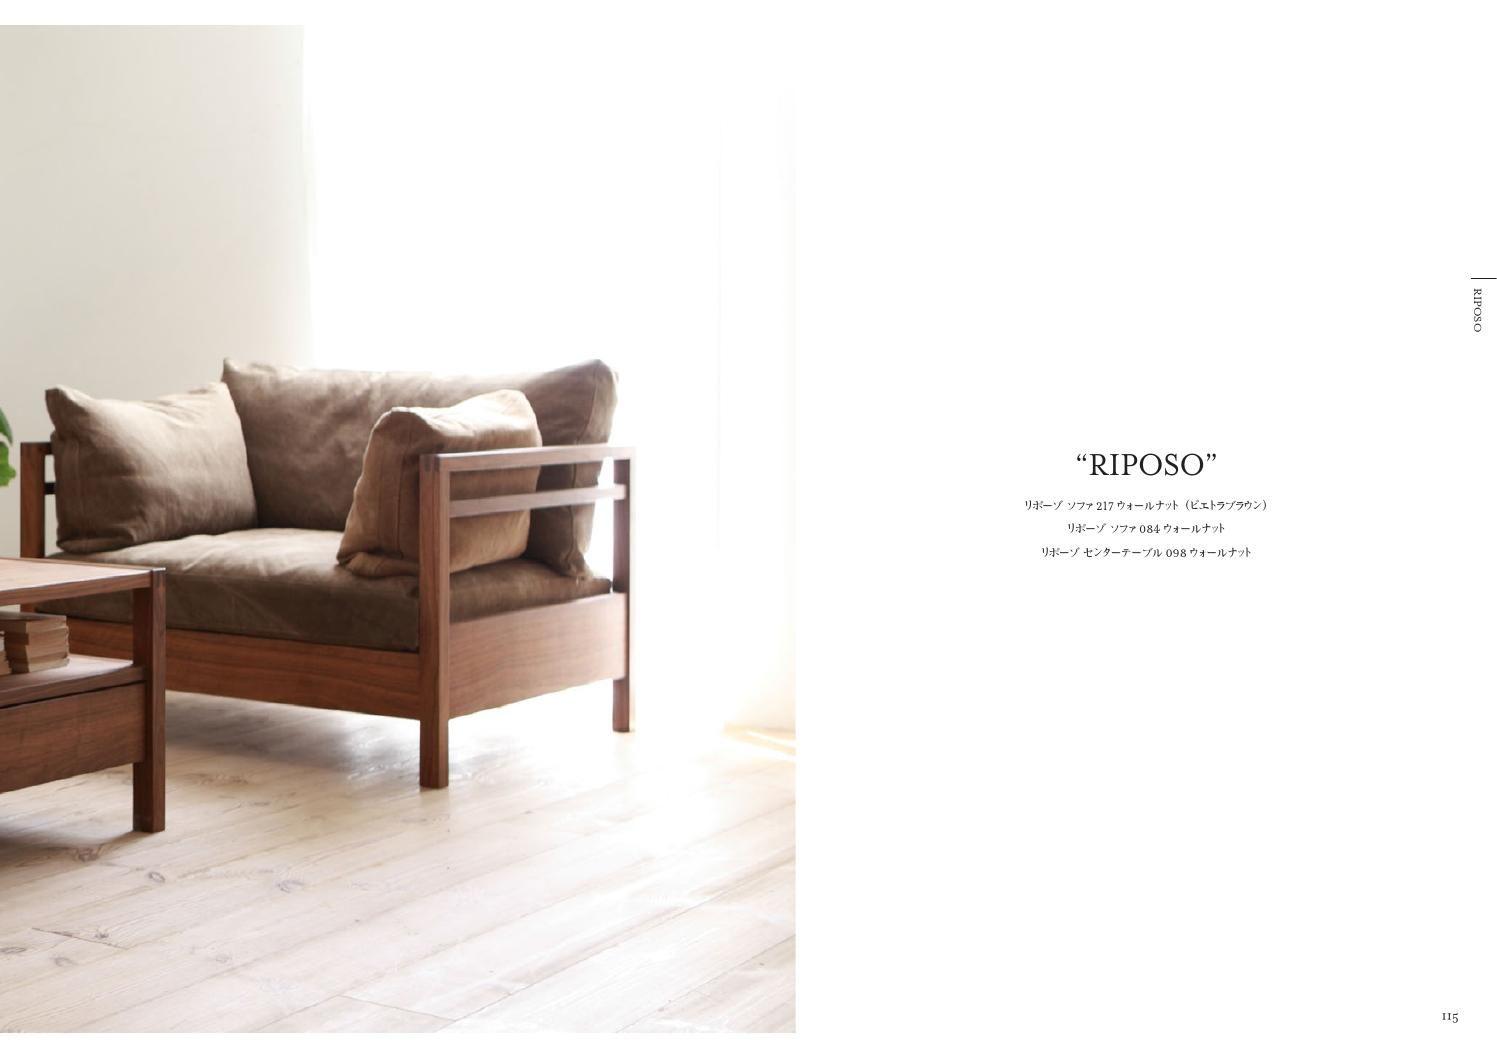 Hiromatsu Furniture Collection vol.04 by Hiromatsu Furniture